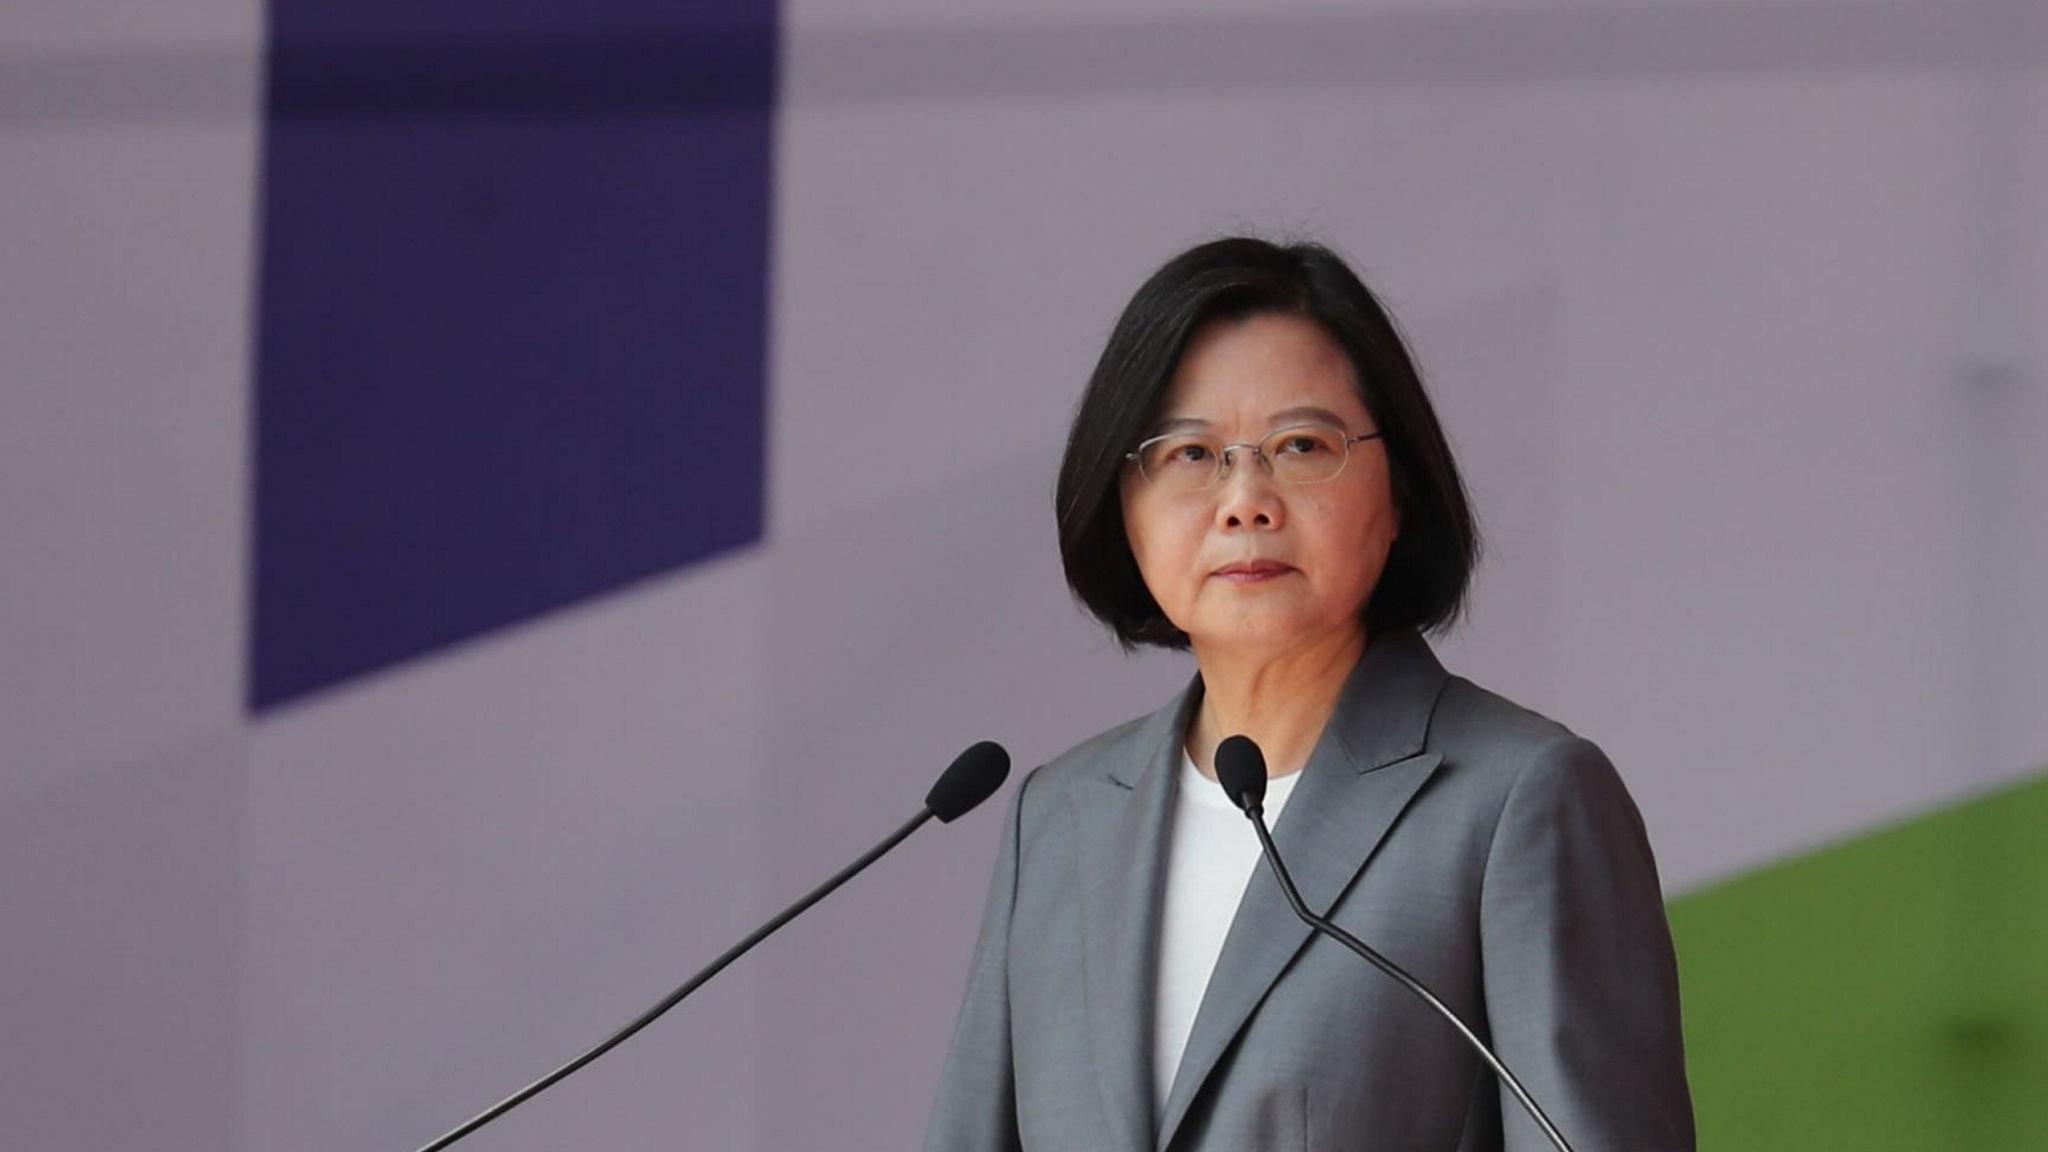 Madaxweynaha Taiwan, Tsai Ing-wen